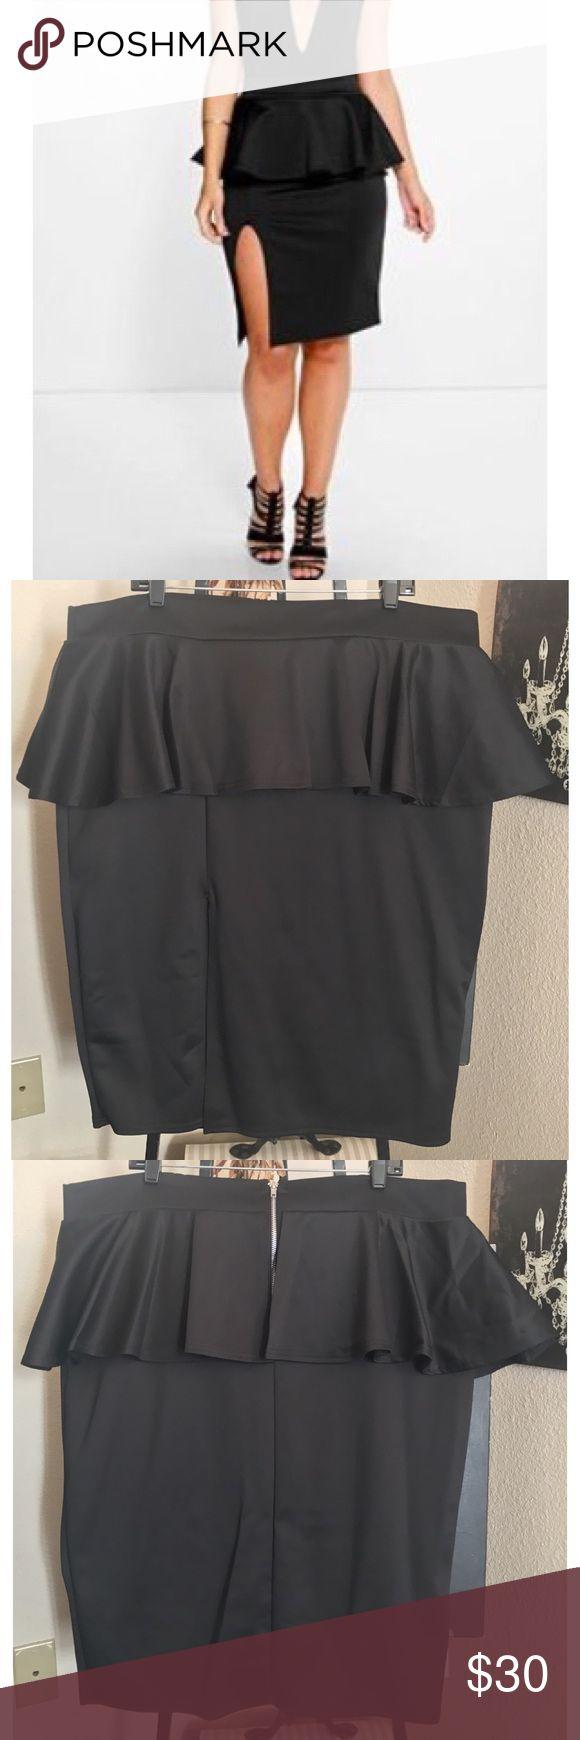 Peplum Skirt Black peplum skirt with high split. True to size. Very sexy! Never worn. NWOT Boohoo Plus Skirts